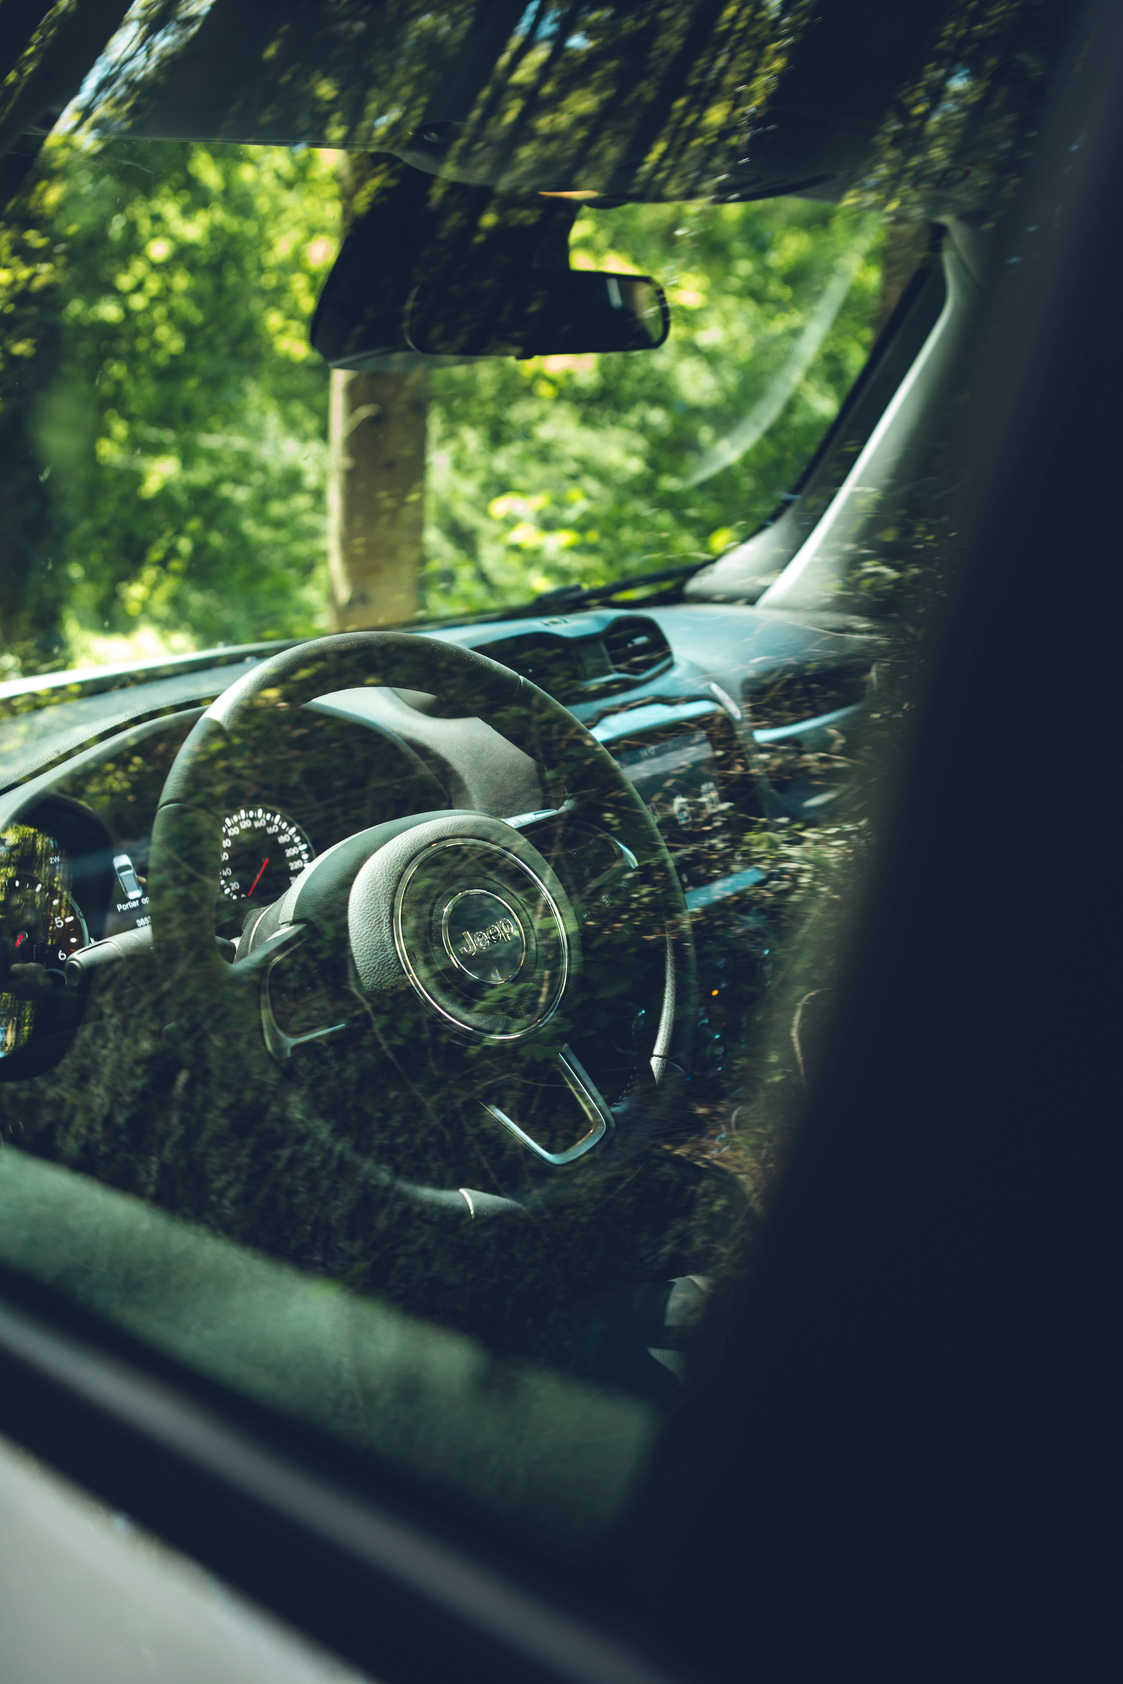 autofotografie-automotivefotografie-sebastien Adriaensen - Jeep renegade interieur